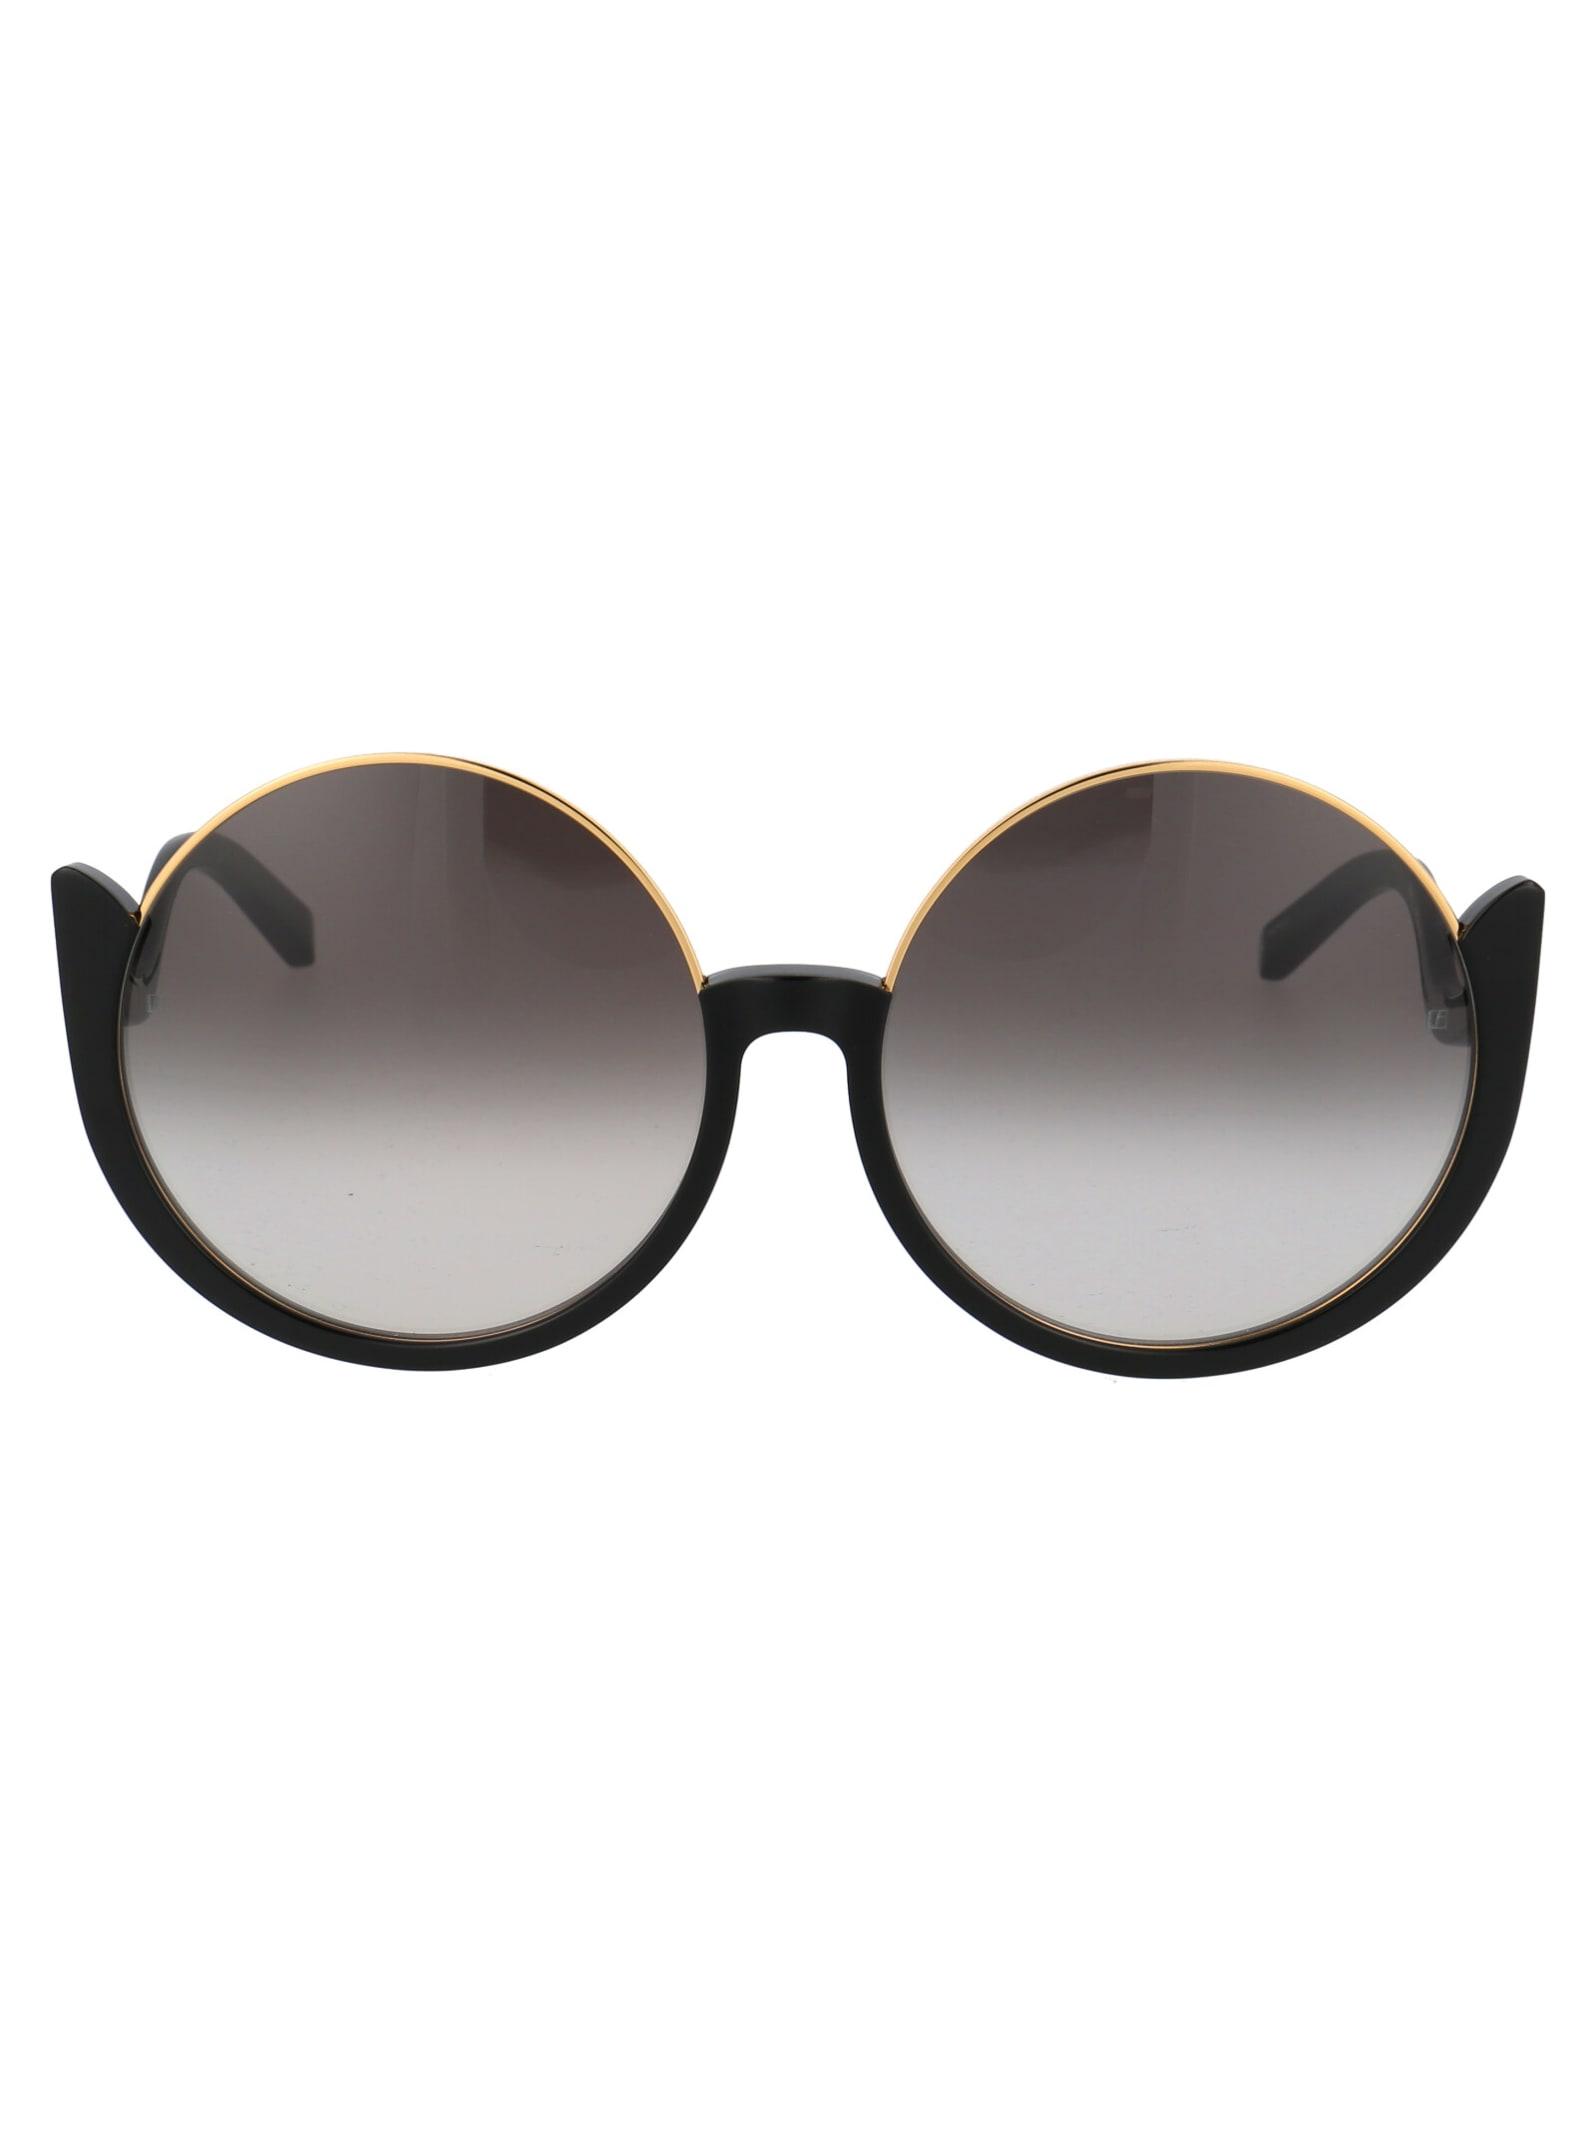 Linda Farrow Sunglasses FLORENCE SUNGLASSES